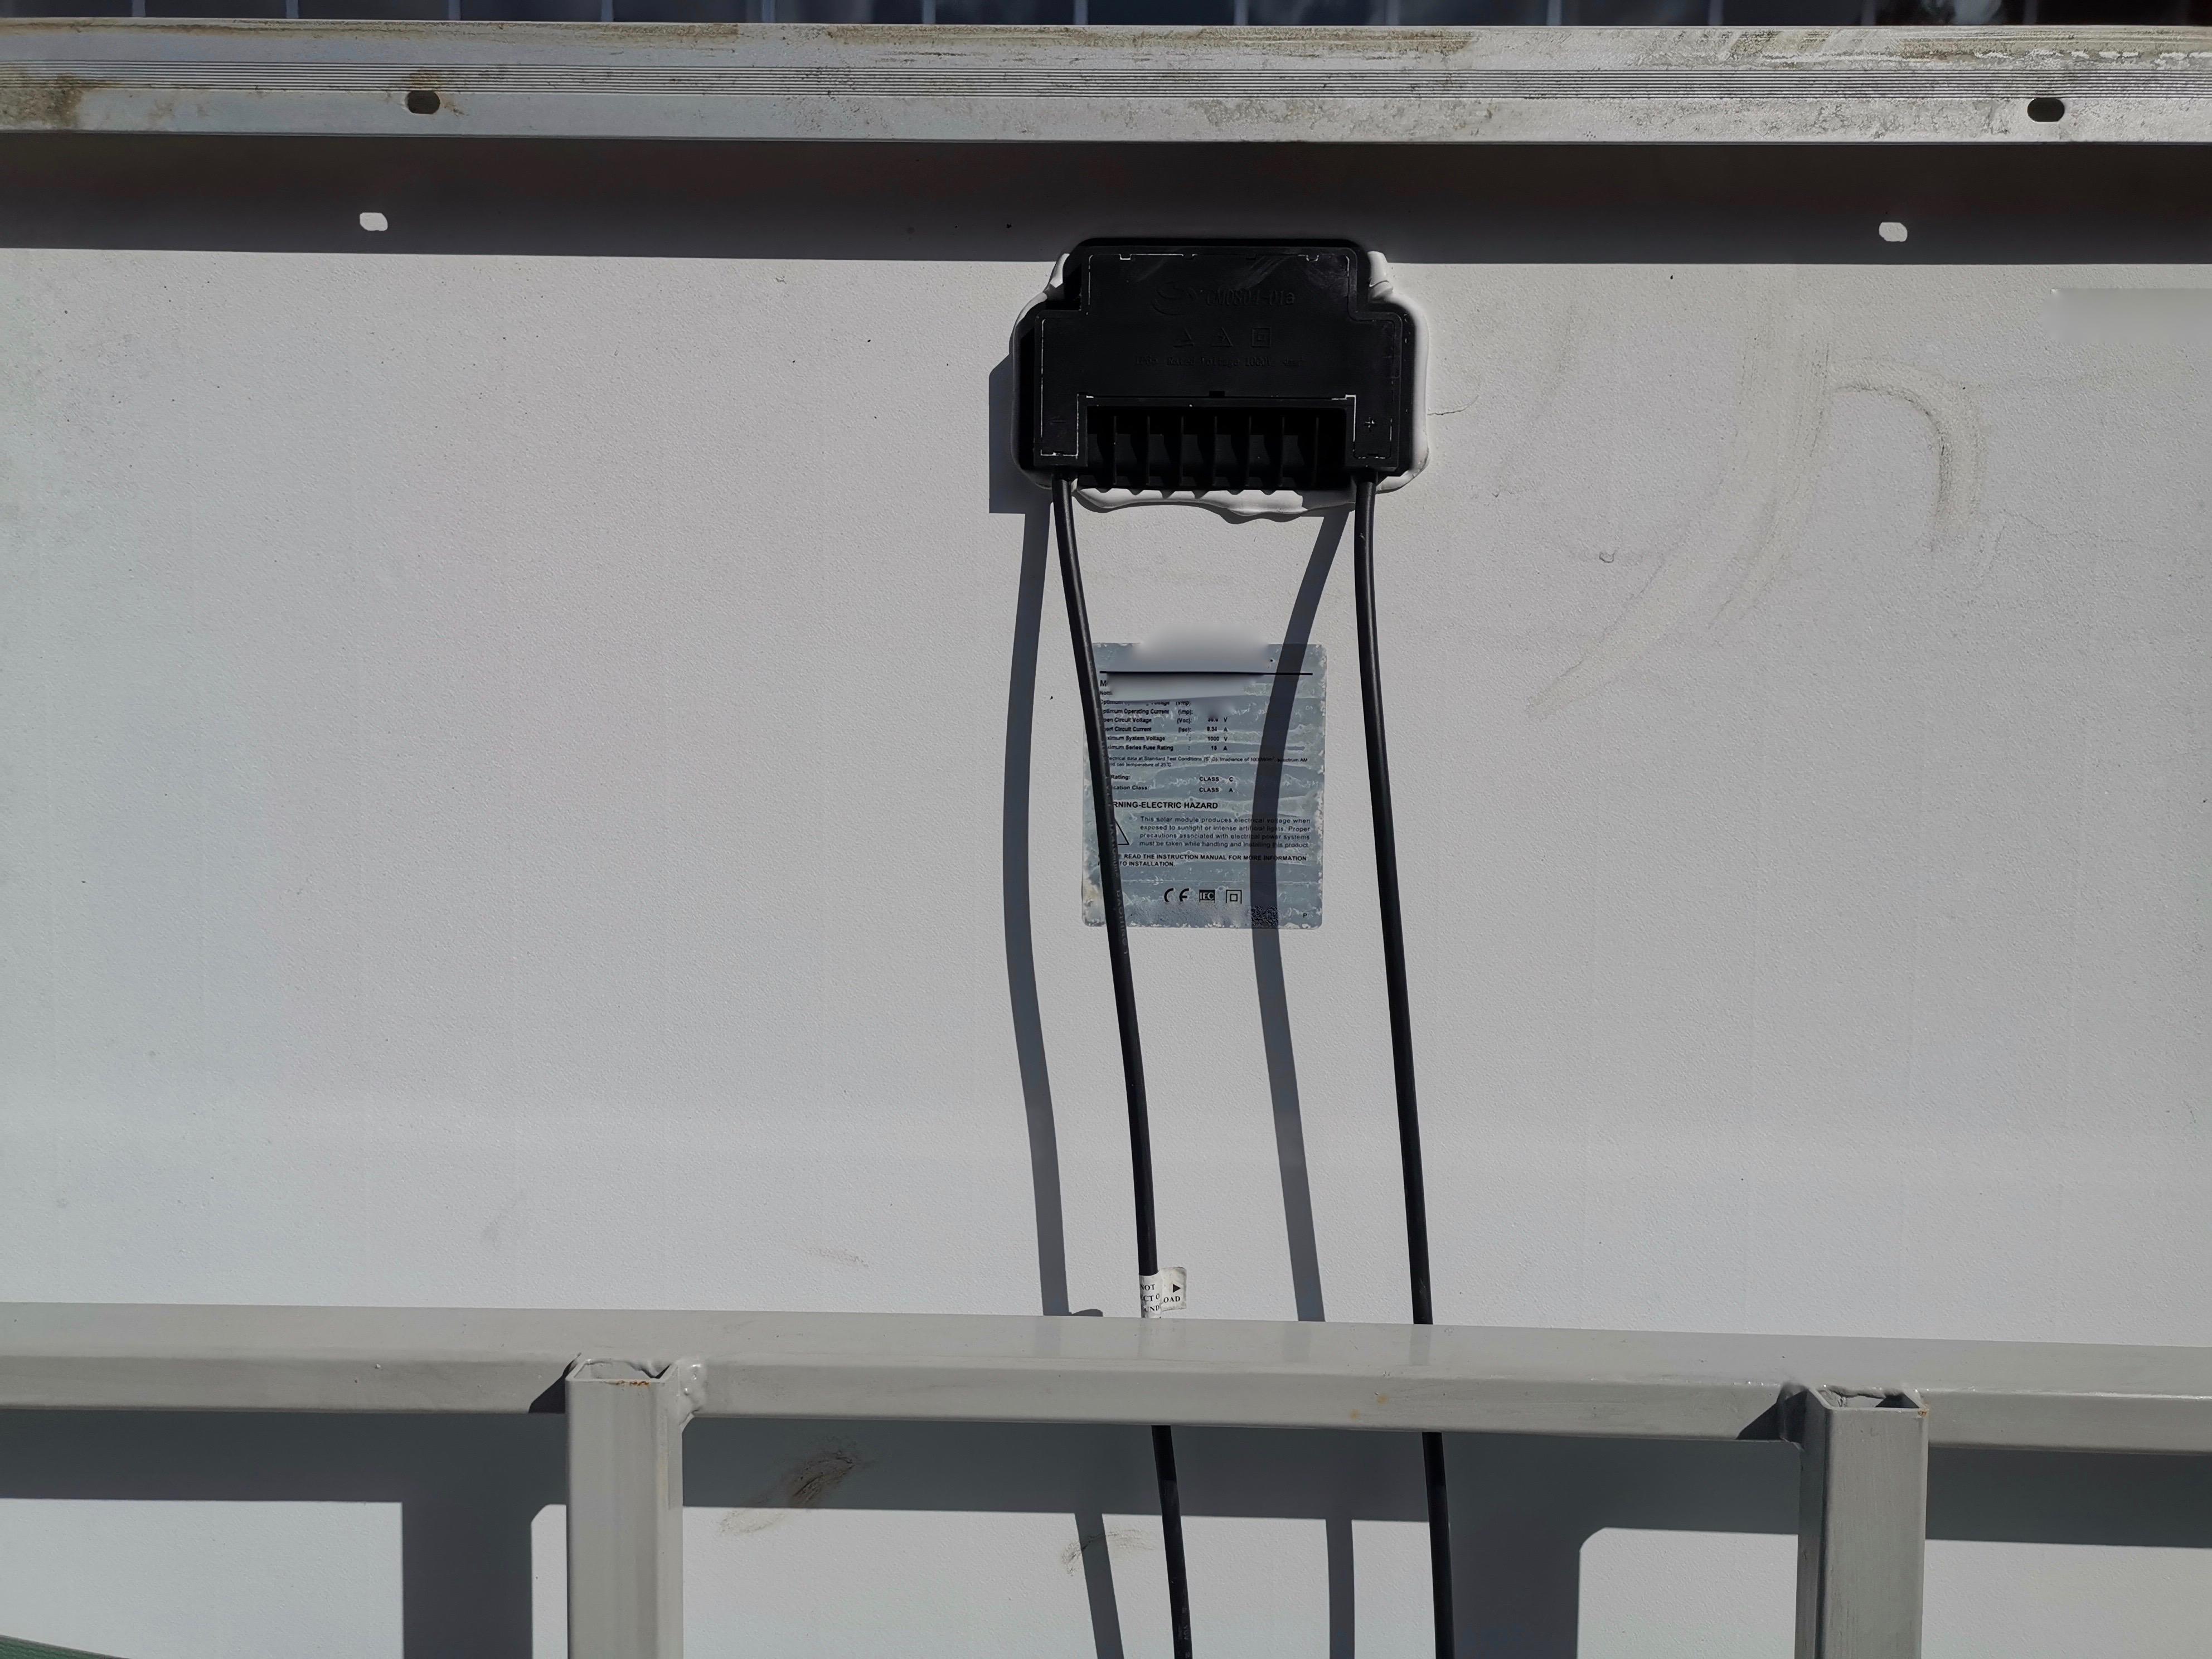 Used solar panels